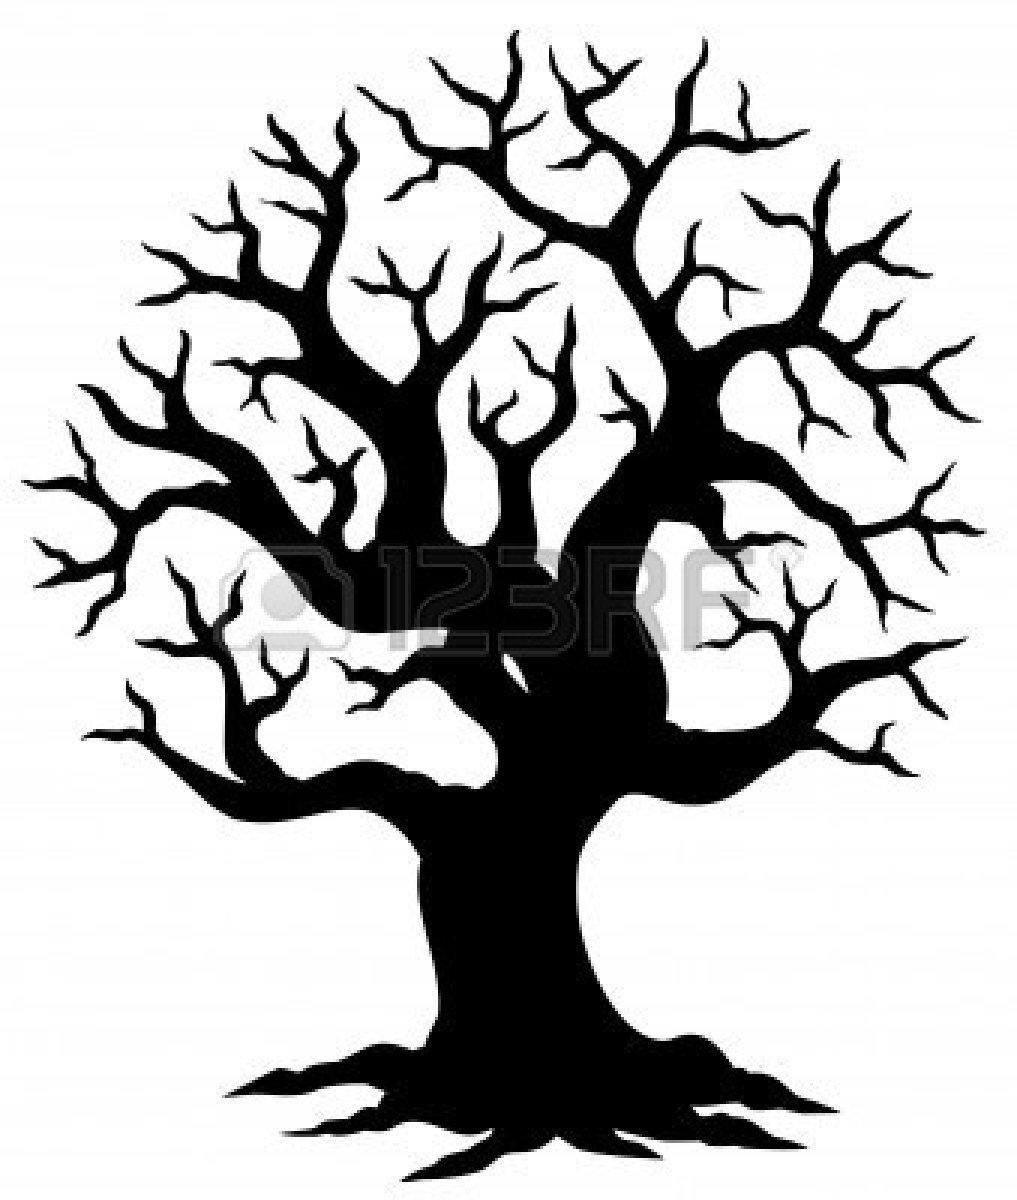 1017x1200 Family Tree Outline